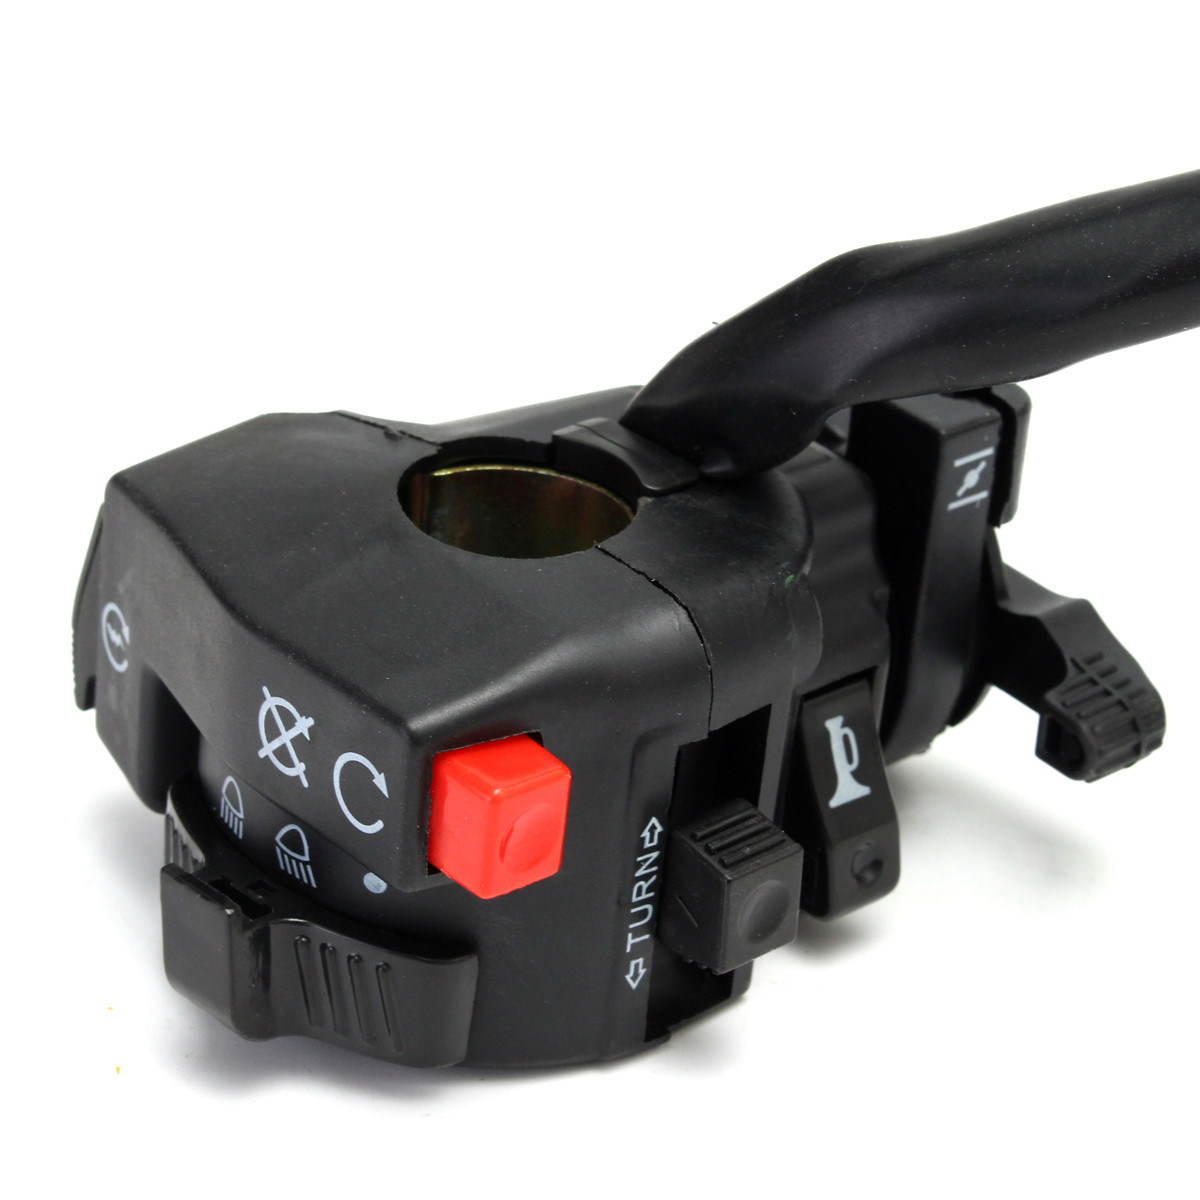 Complete Electrics Wiring Harness For Chinese Dirt Bike Atv Quad 150 Plastic E9296817 E087 42c1 9cda 252aa13cd277